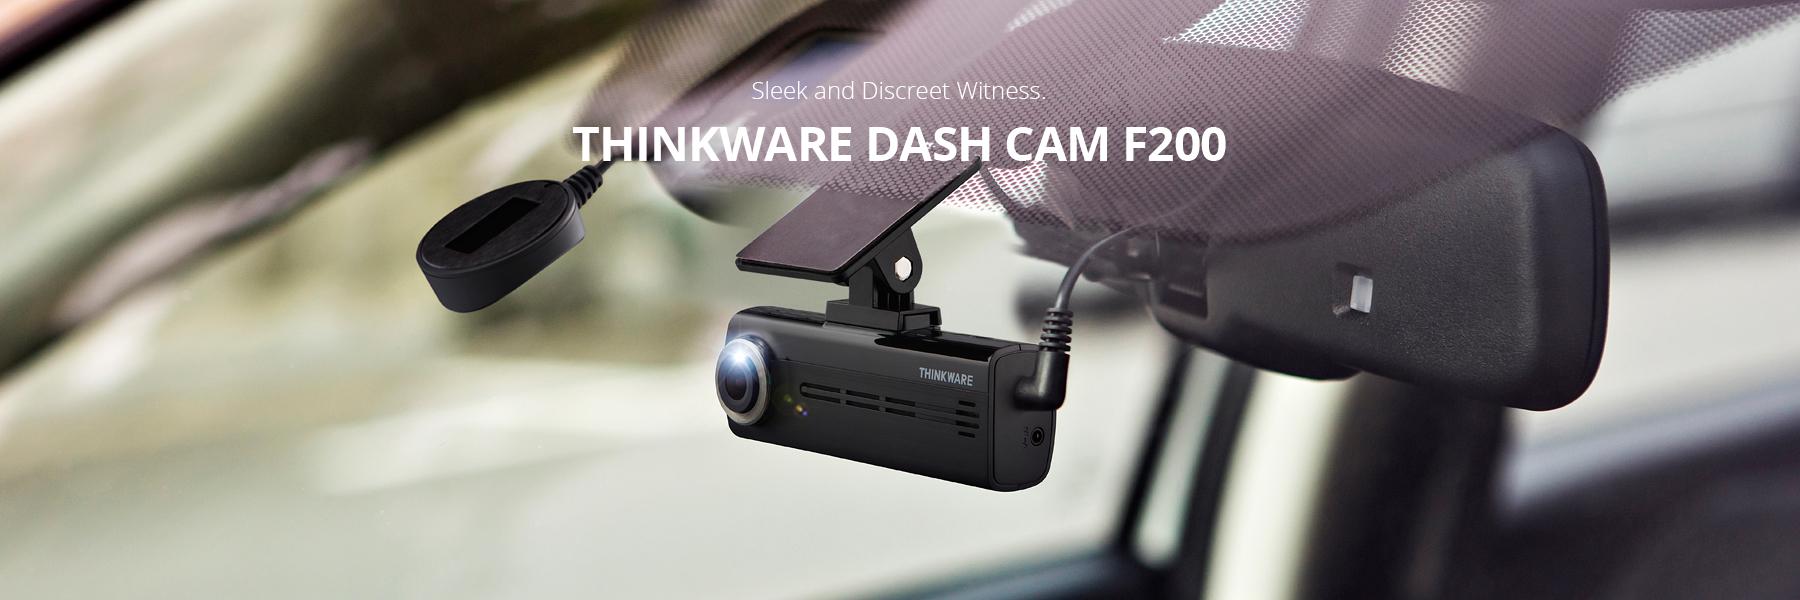 thinkware dash cam F200